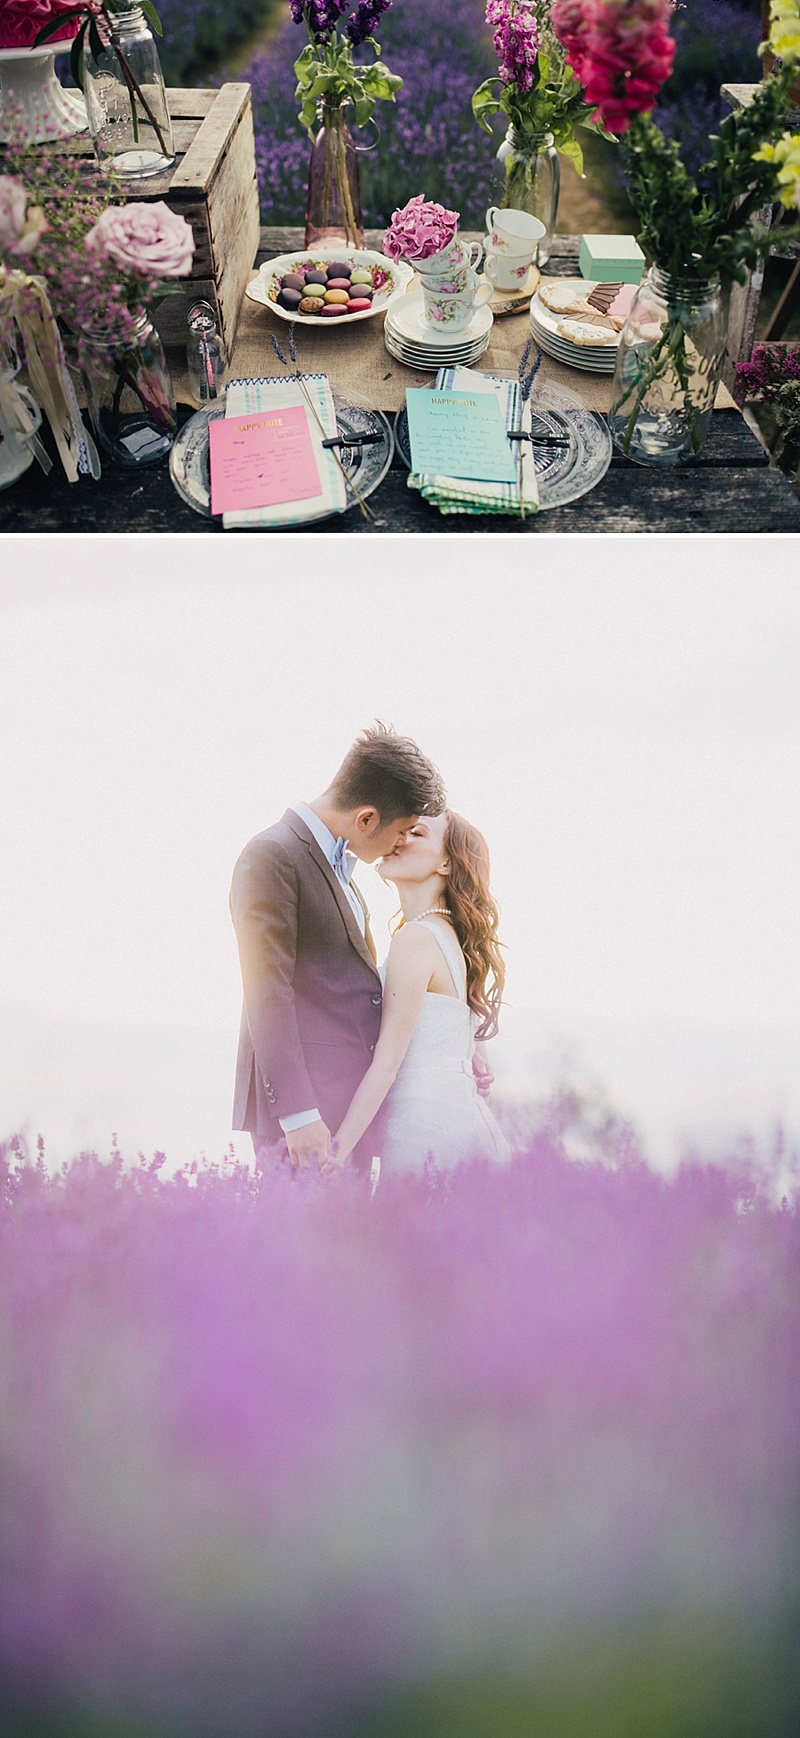 Hong kong pre wedding overseas surrey mayfield lavender styled london wedding photography